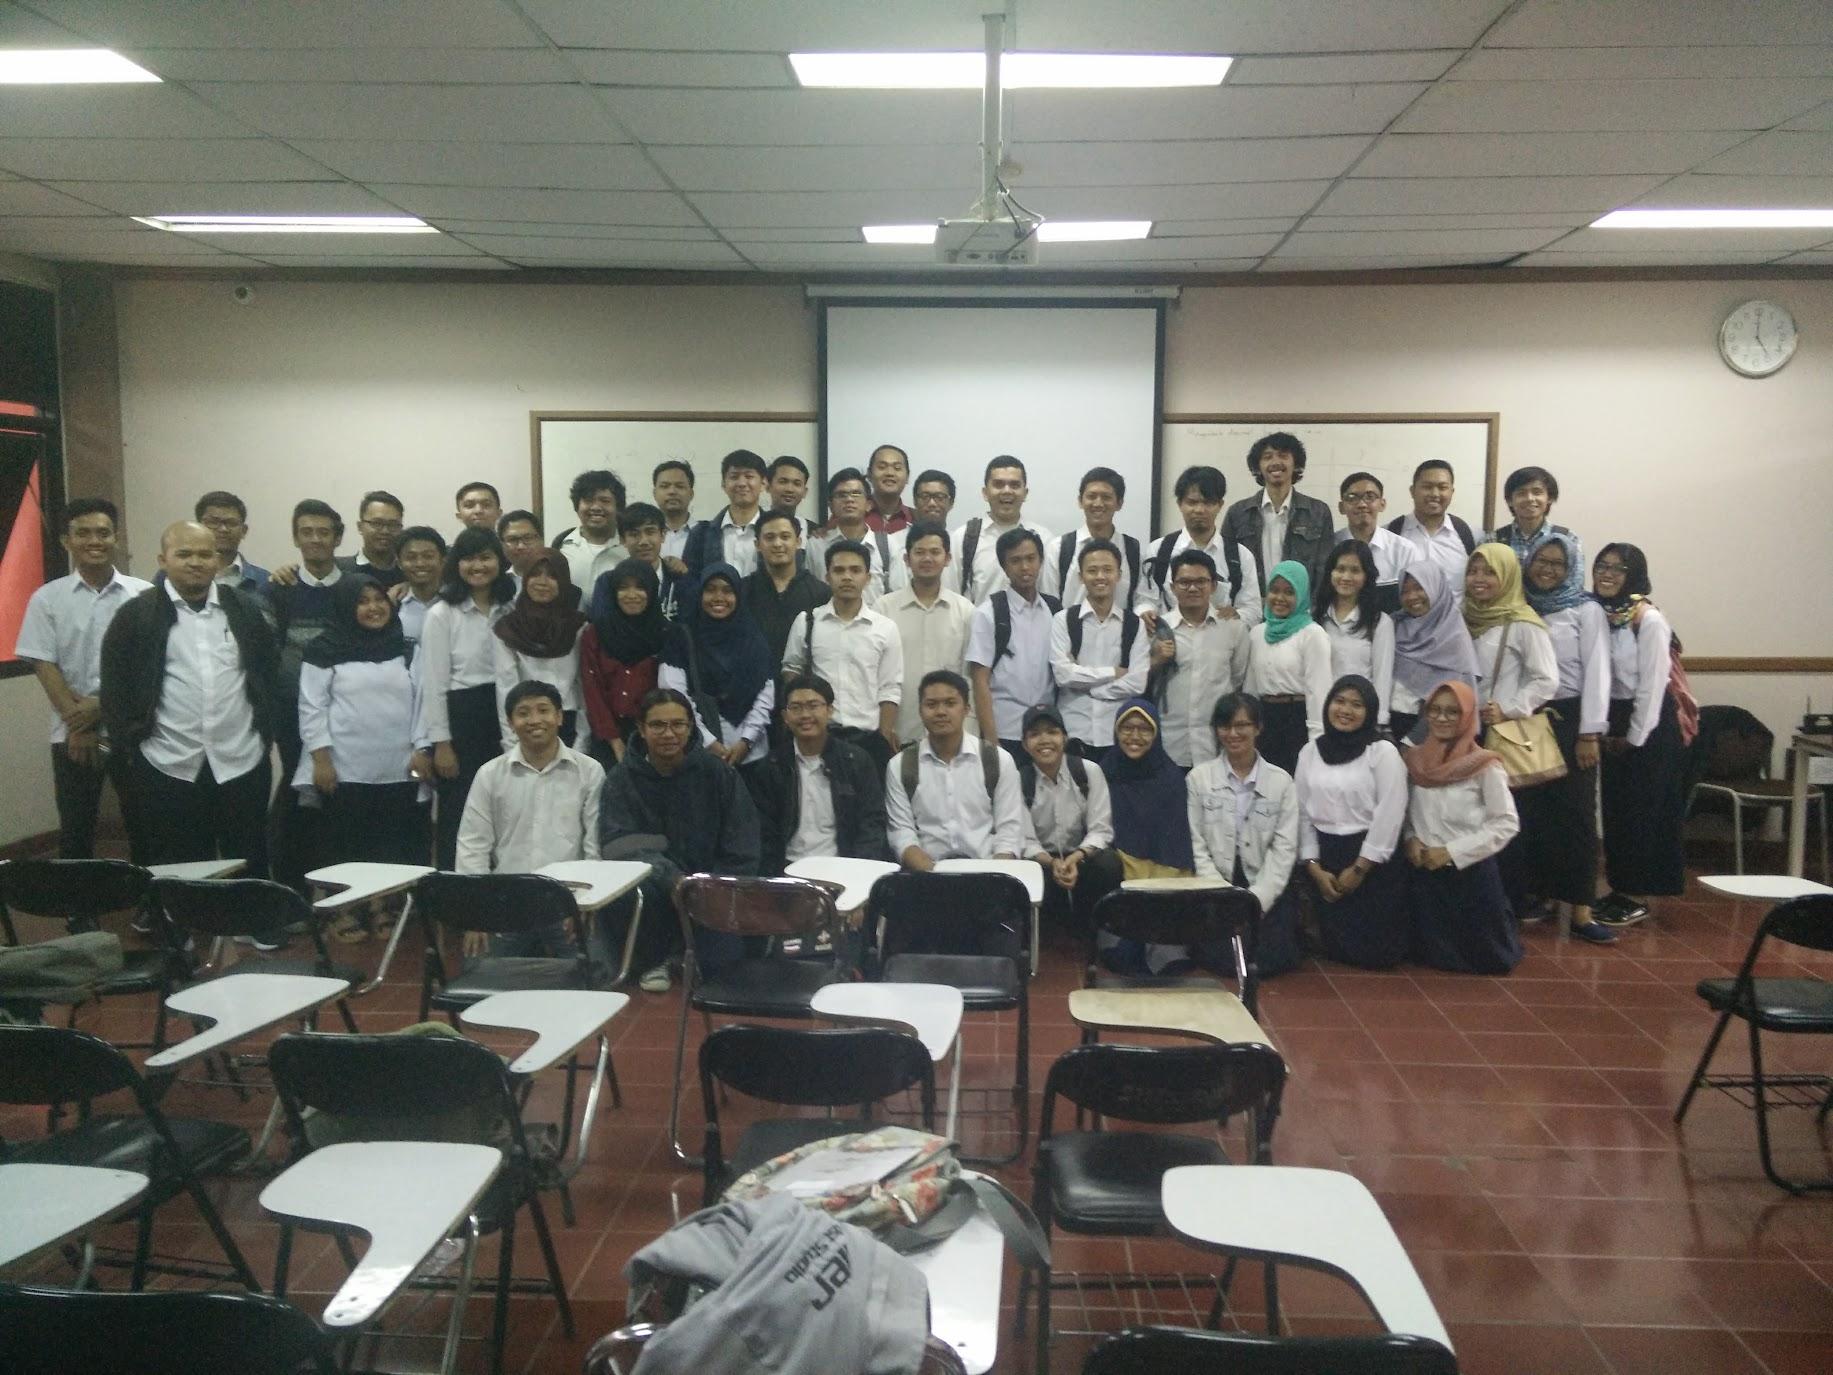 2017-08-22 - IFX-40-01 - Before AI 2017-2018